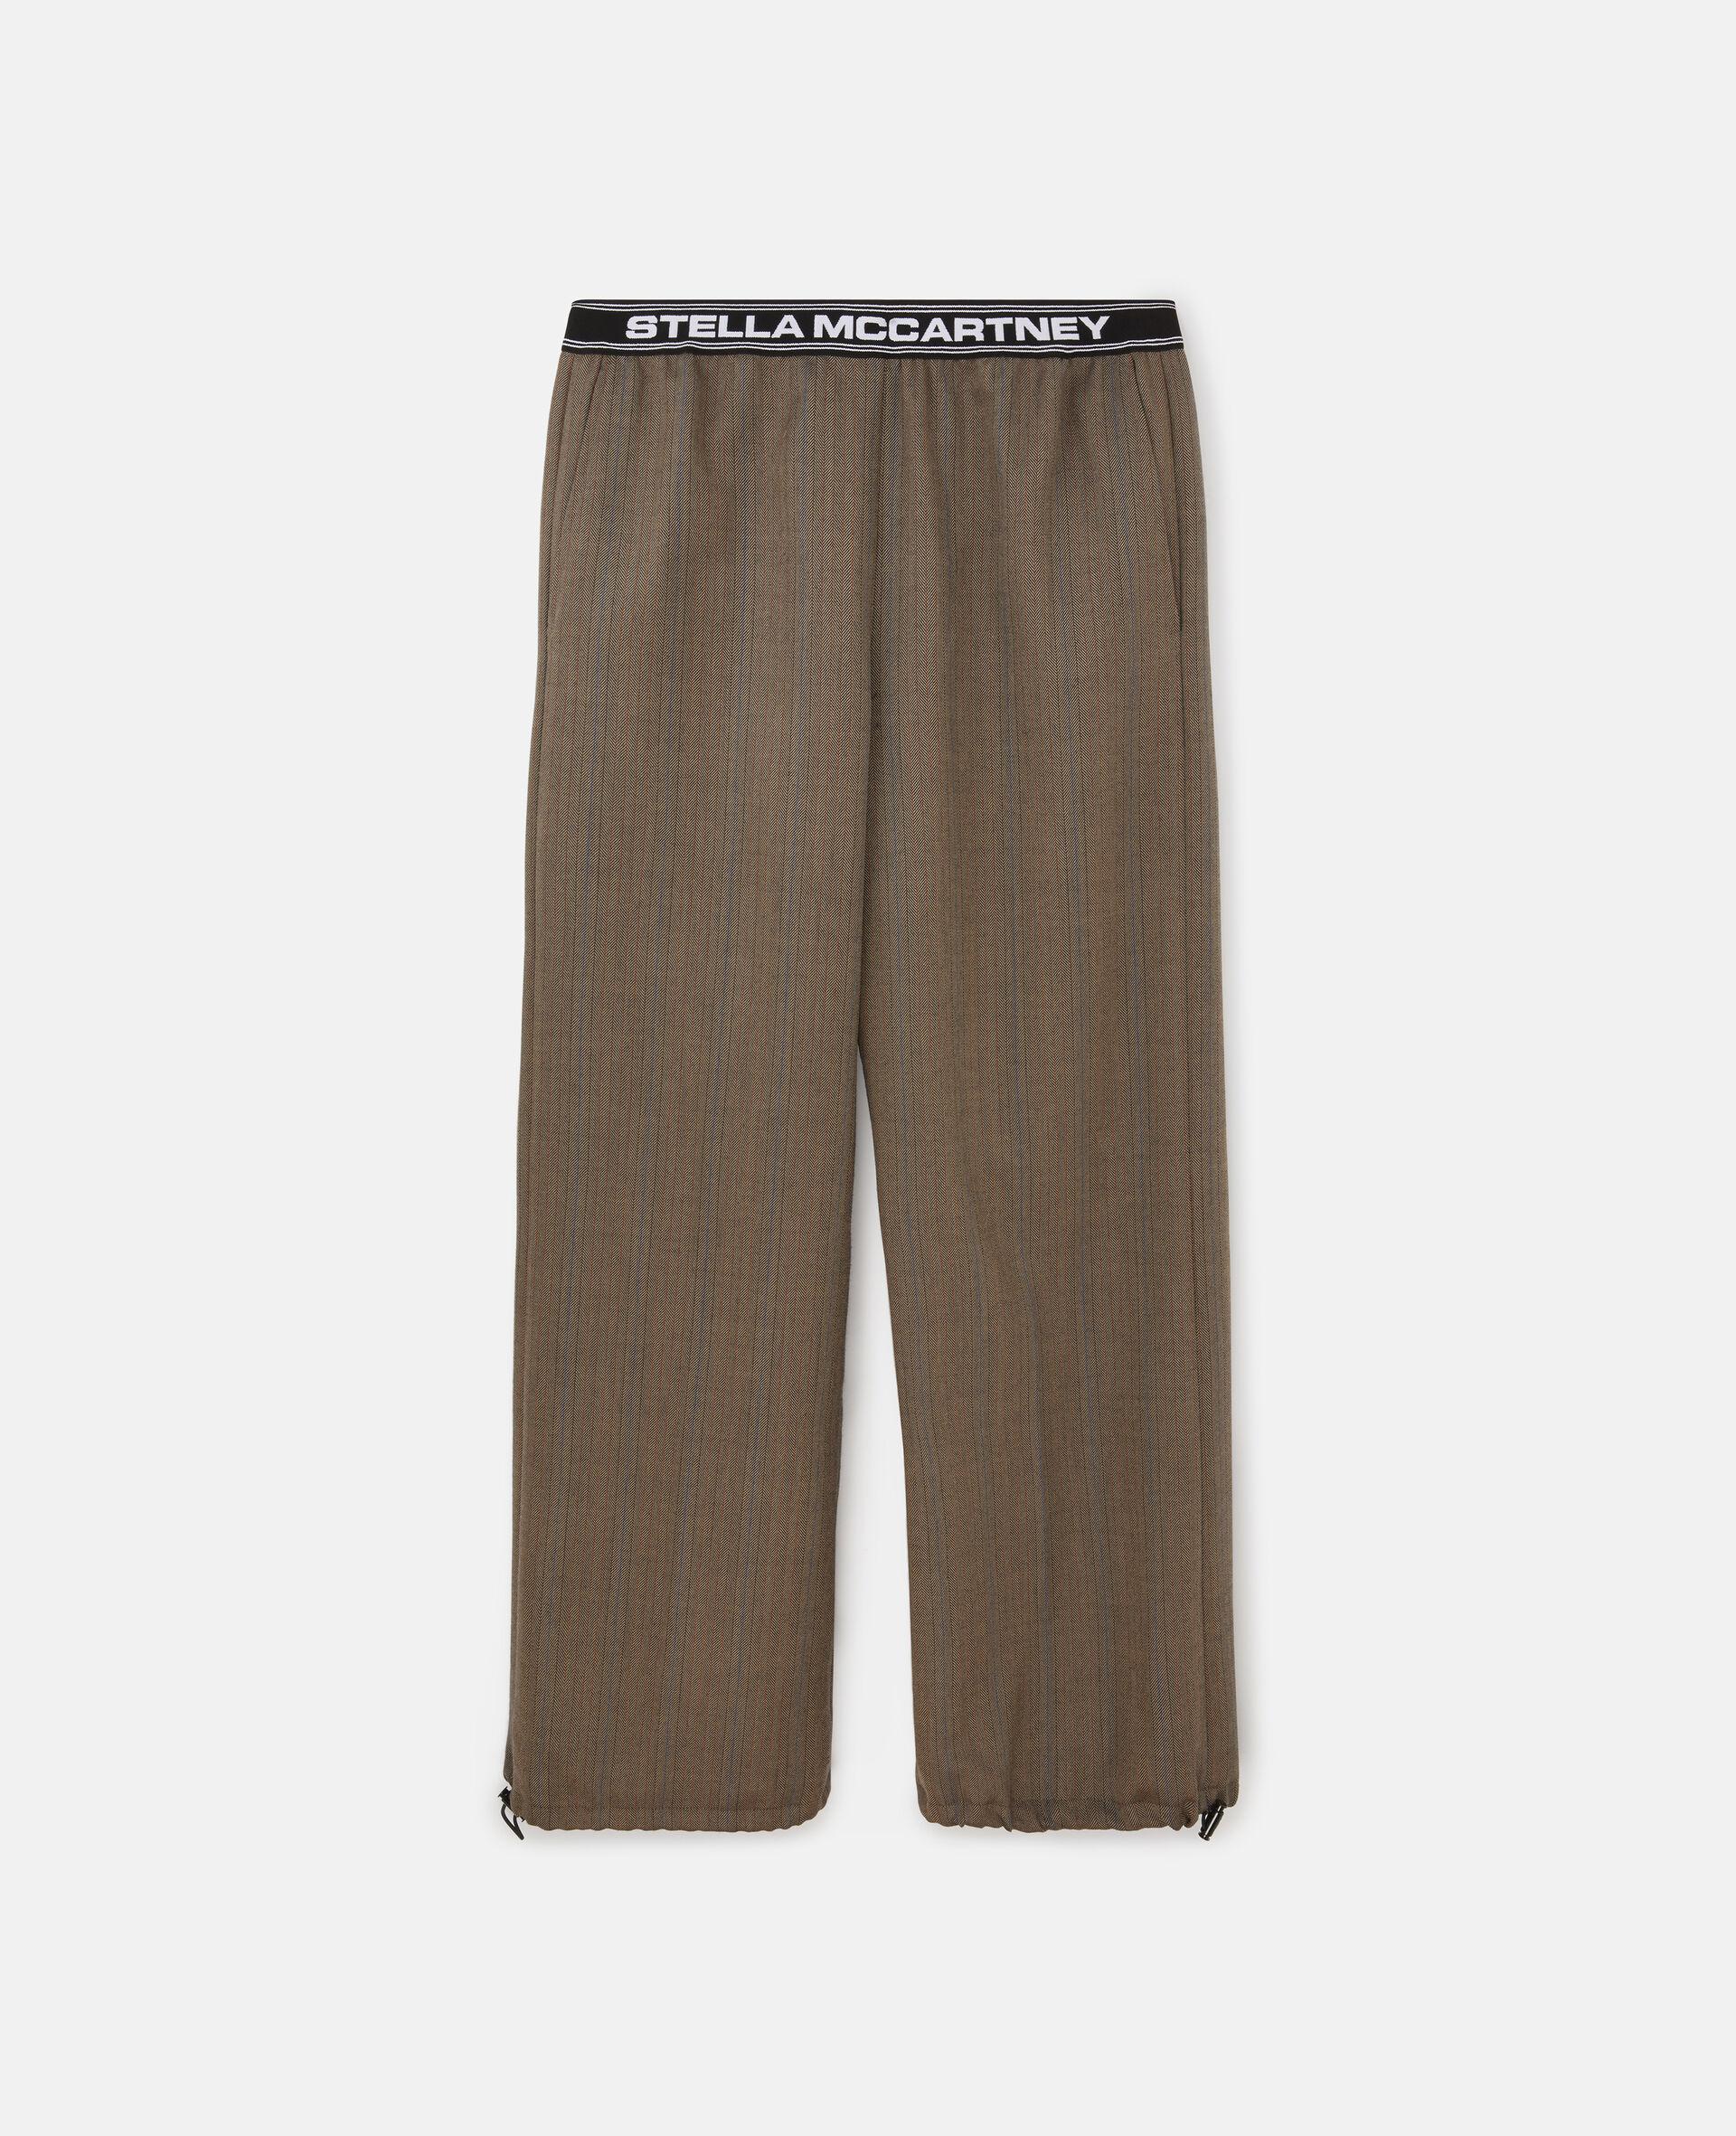 Pantaloni Sartoriali con Logo Stella -Fantasia-large image number 0